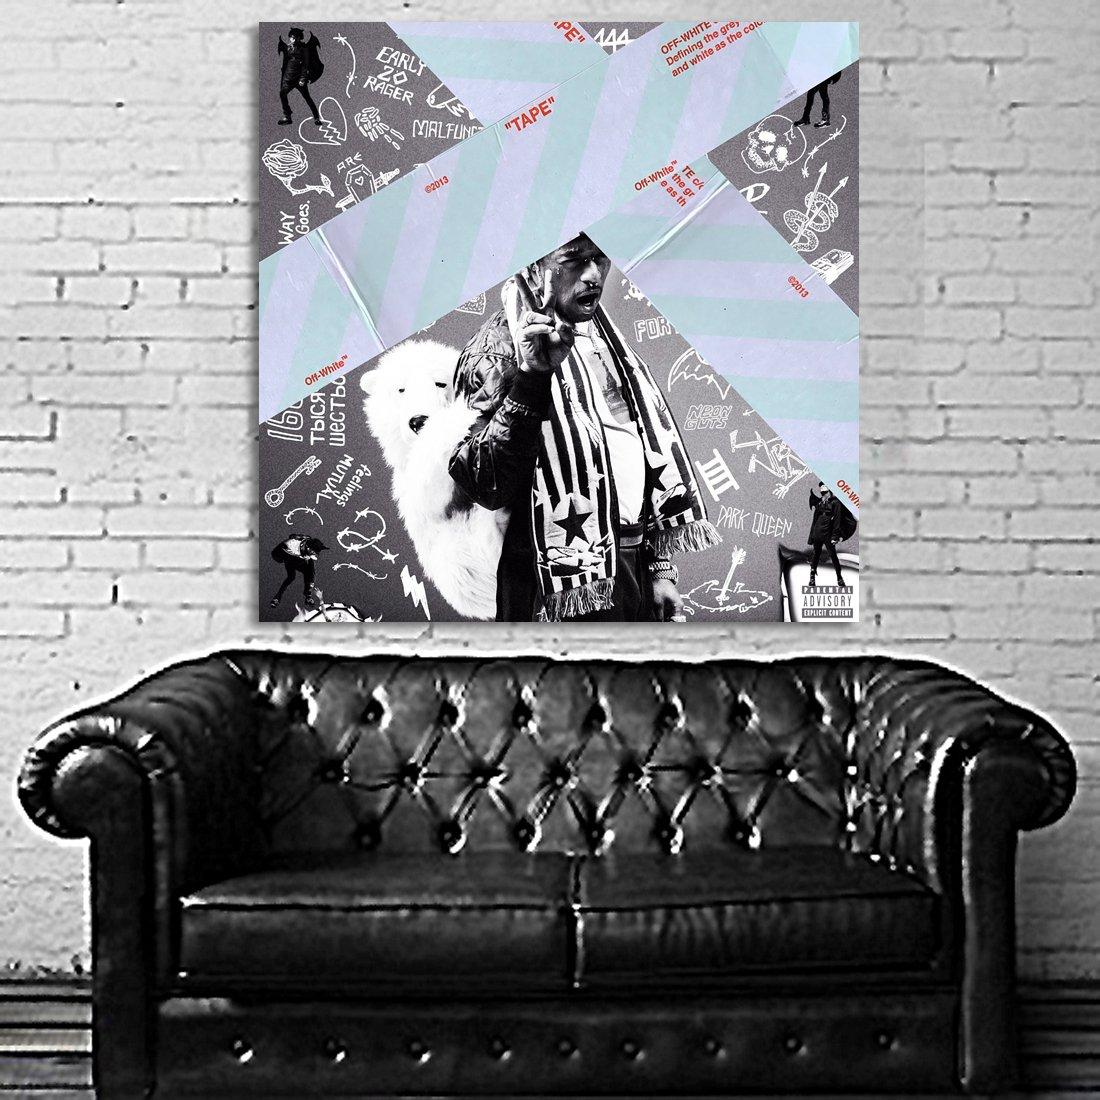 Poster Mural Lil Uzi Vert 40x40 inch (100x100 cm) on Adhesive Vinyl #10